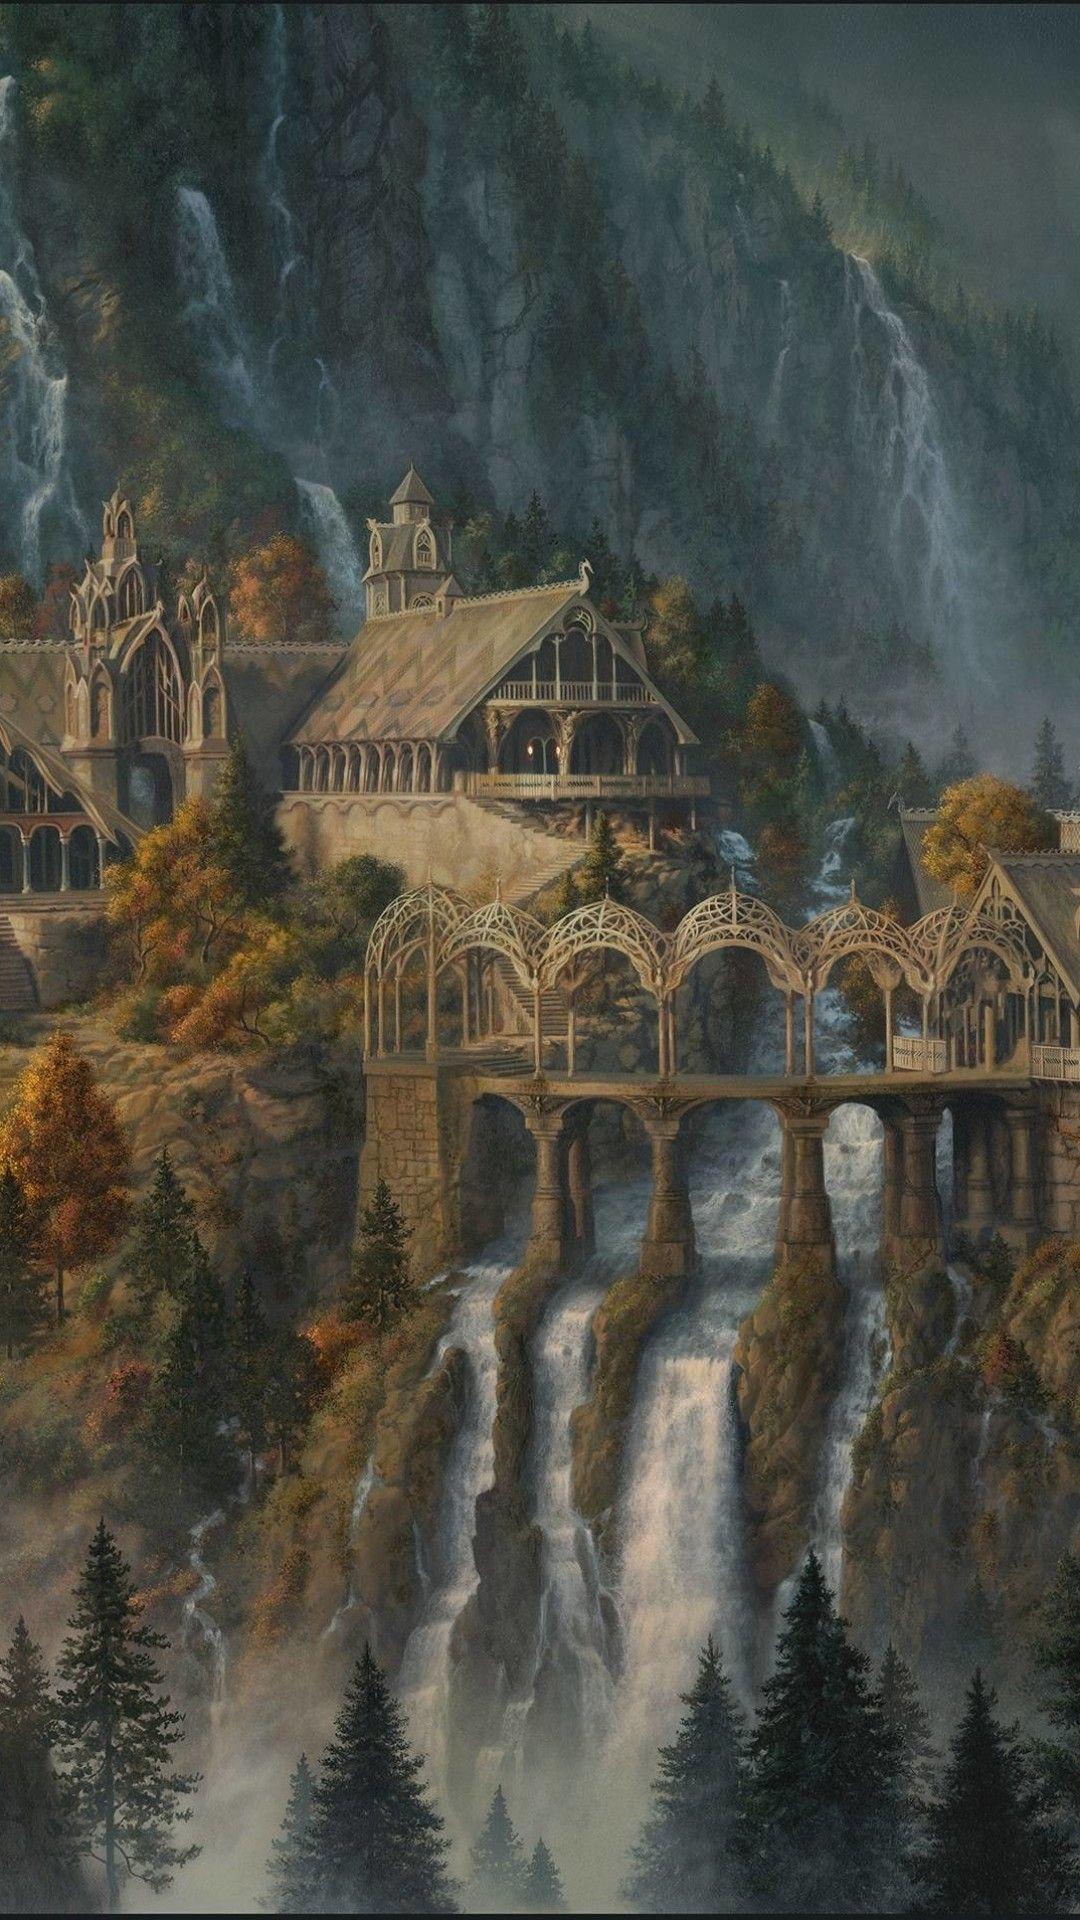 Lord Of The Ring Wallpaper : wallpaper, Rings, Mobile, Wallpapers, Wallpaper